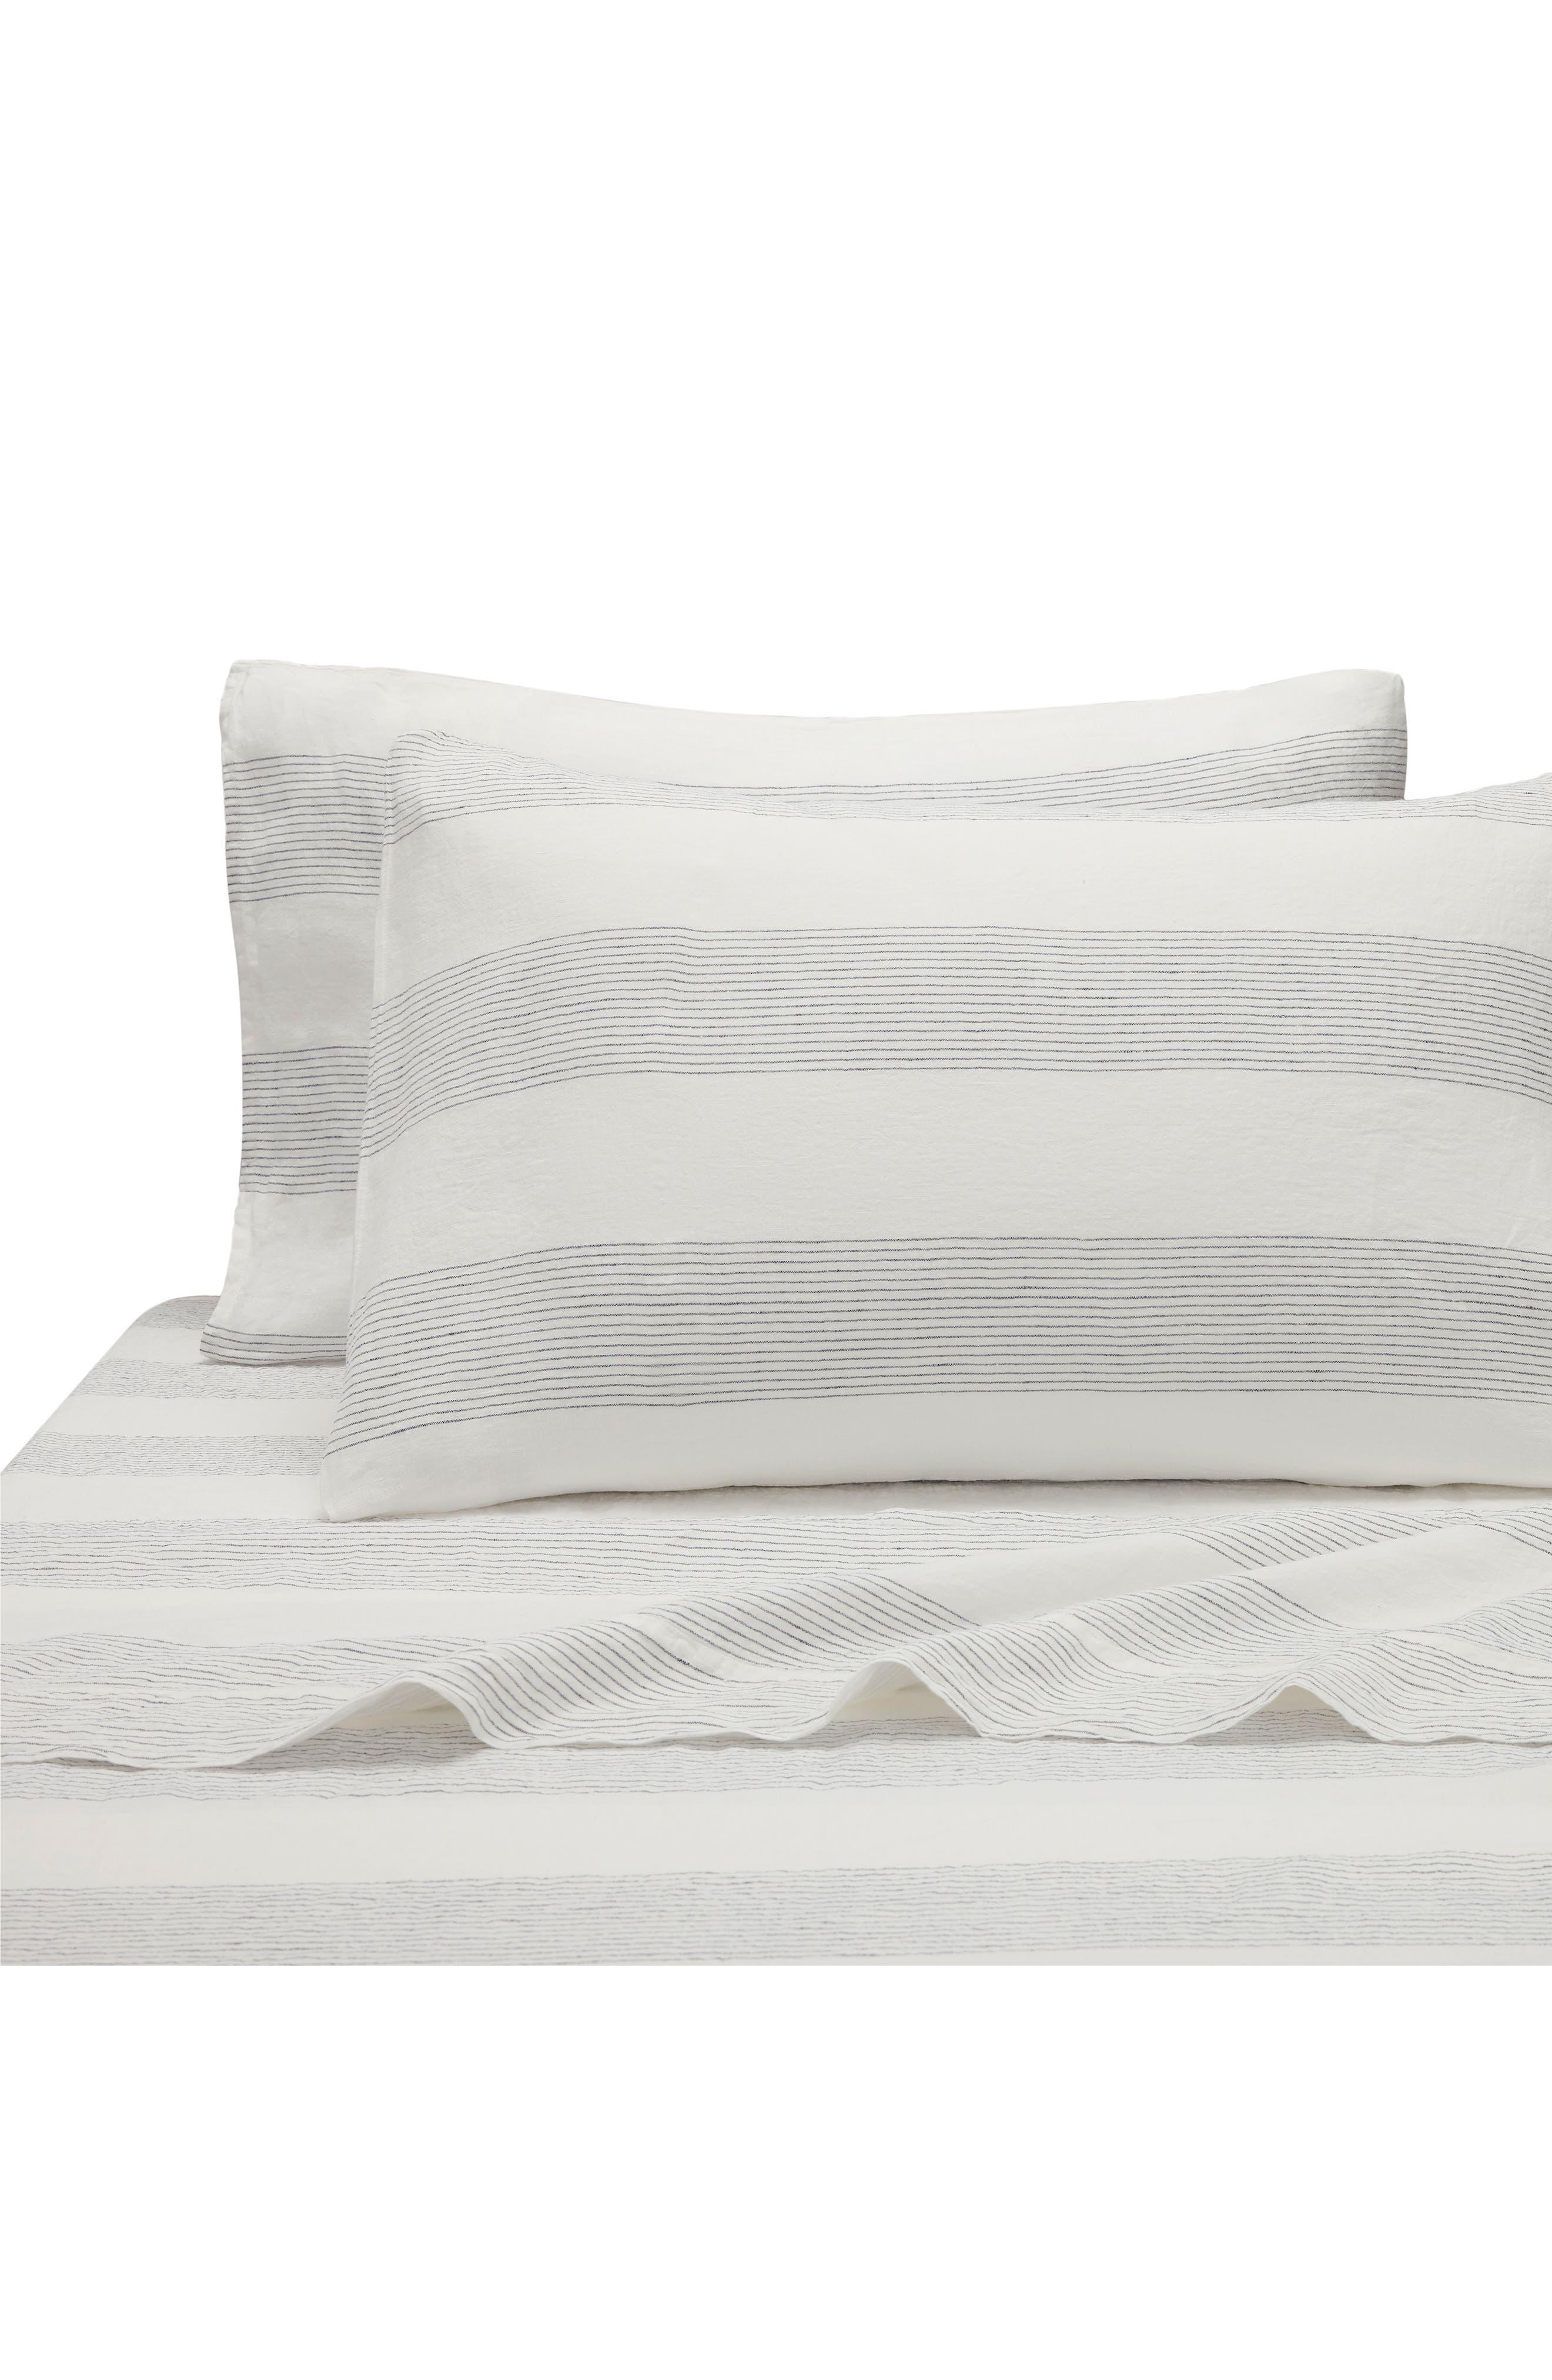 Amagansett Linen 300 Thread Count Pillowcase,                             Main thumbnail 1, color,                             100